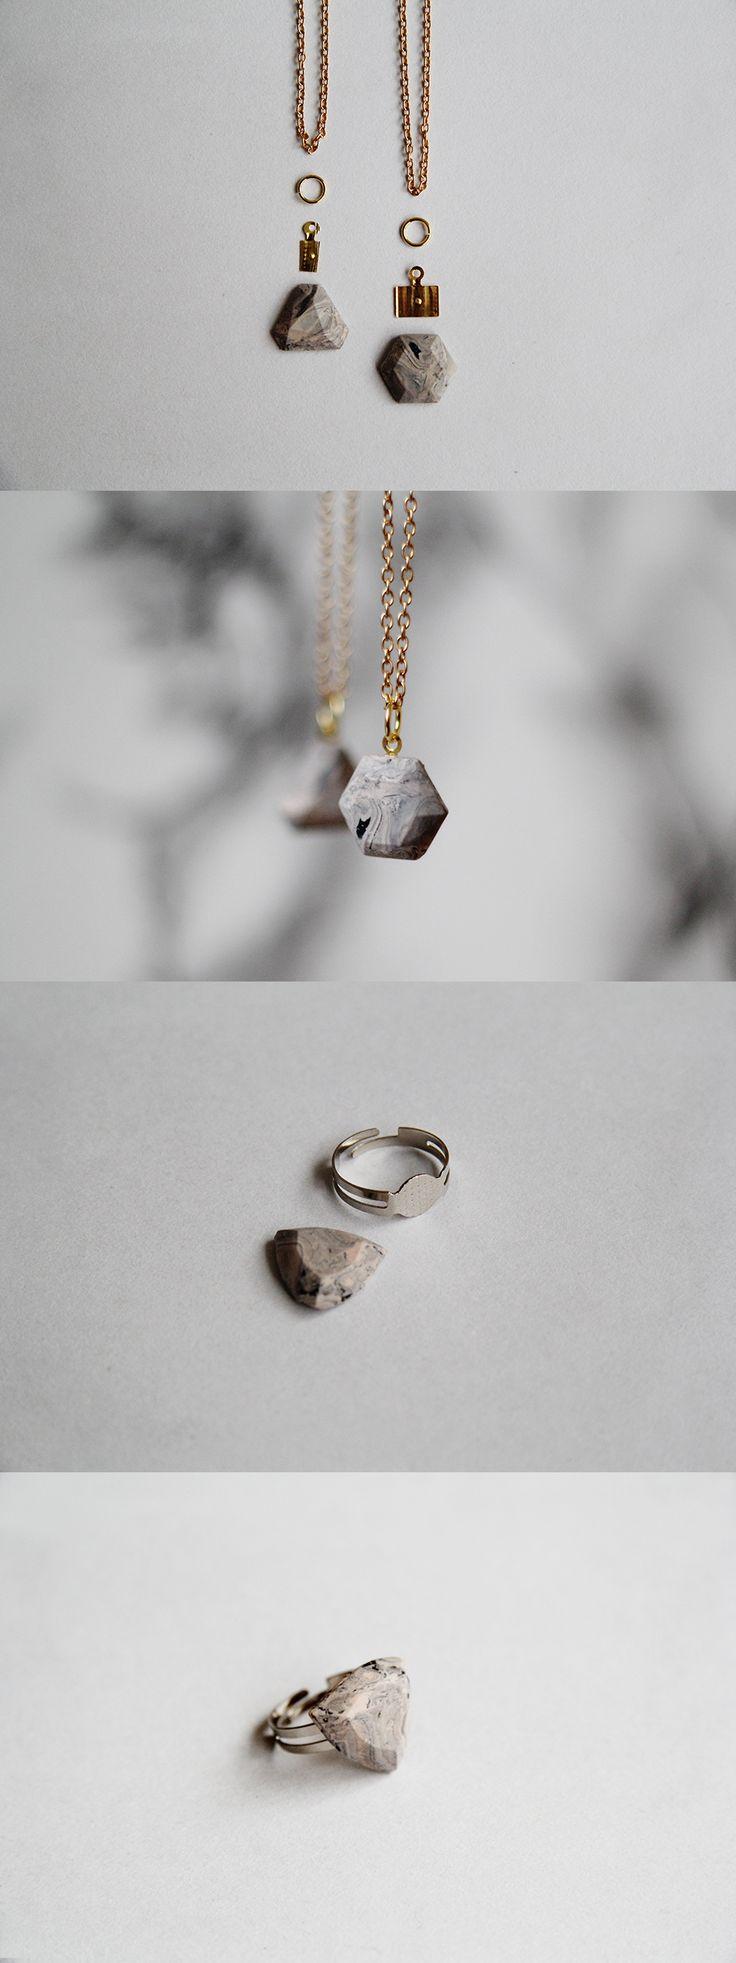 Marble Gem Stone DIY